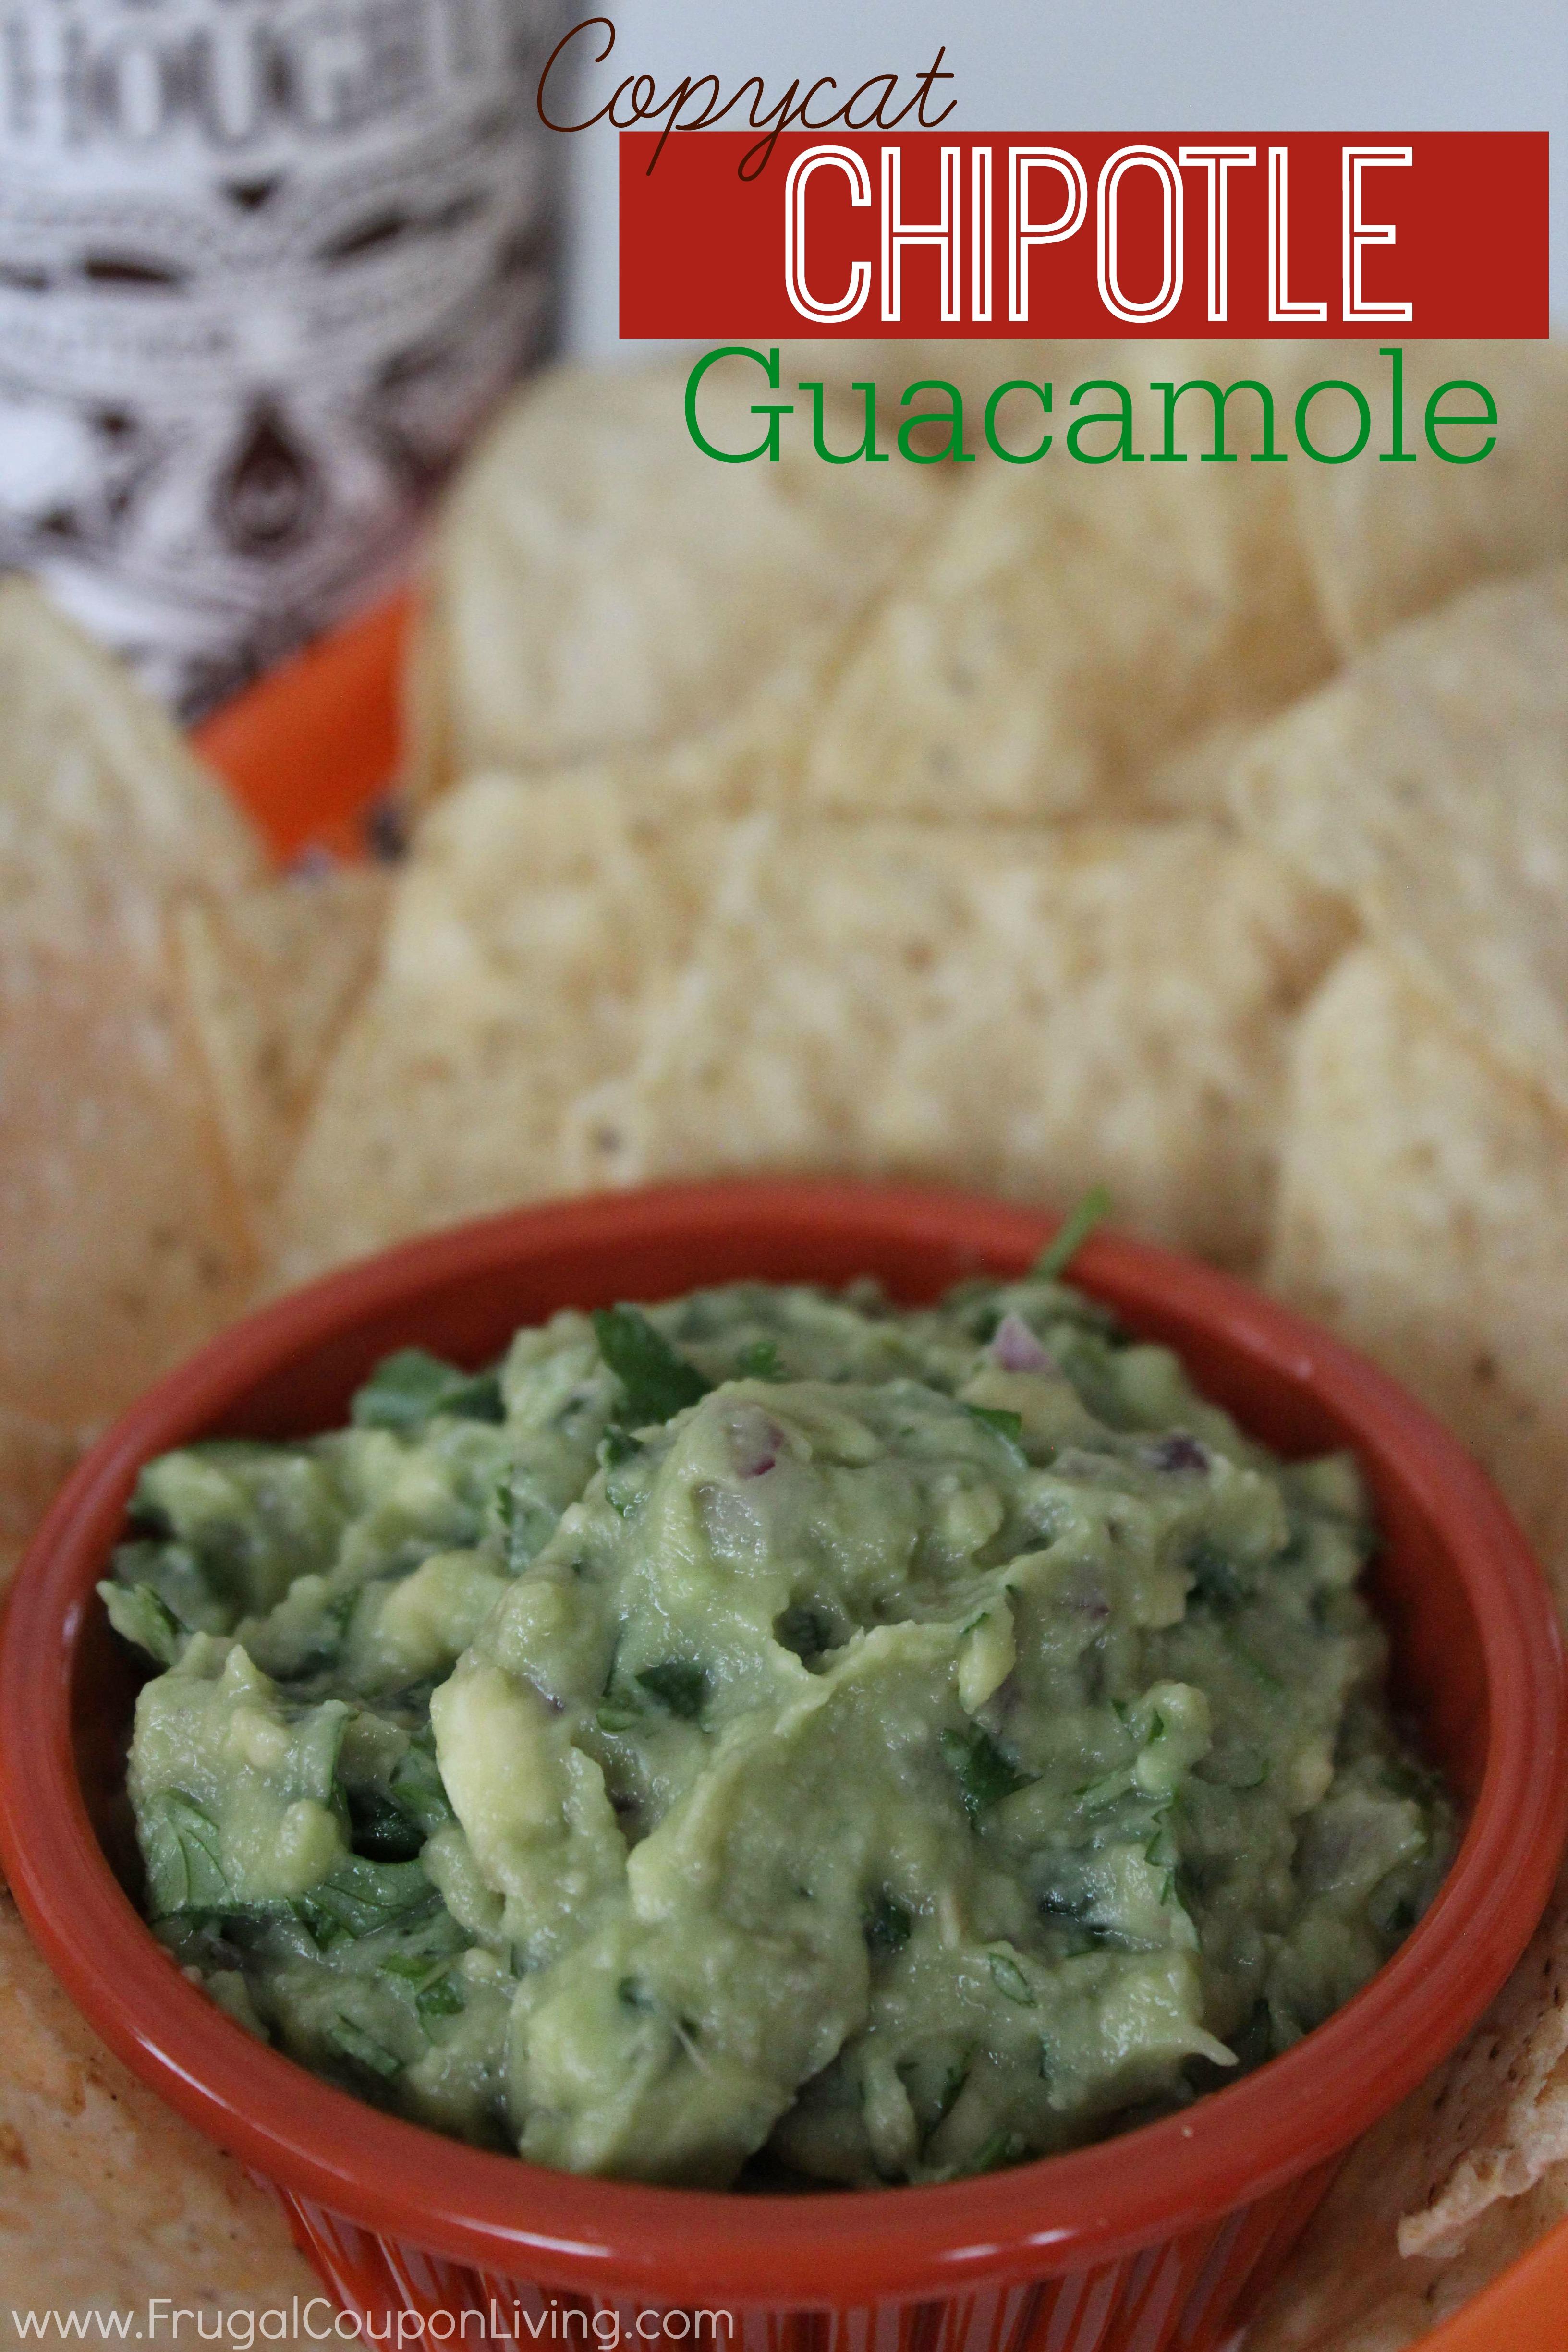 Copycat Chipotle Guacamole Recipe and Other Chipotle Recipes